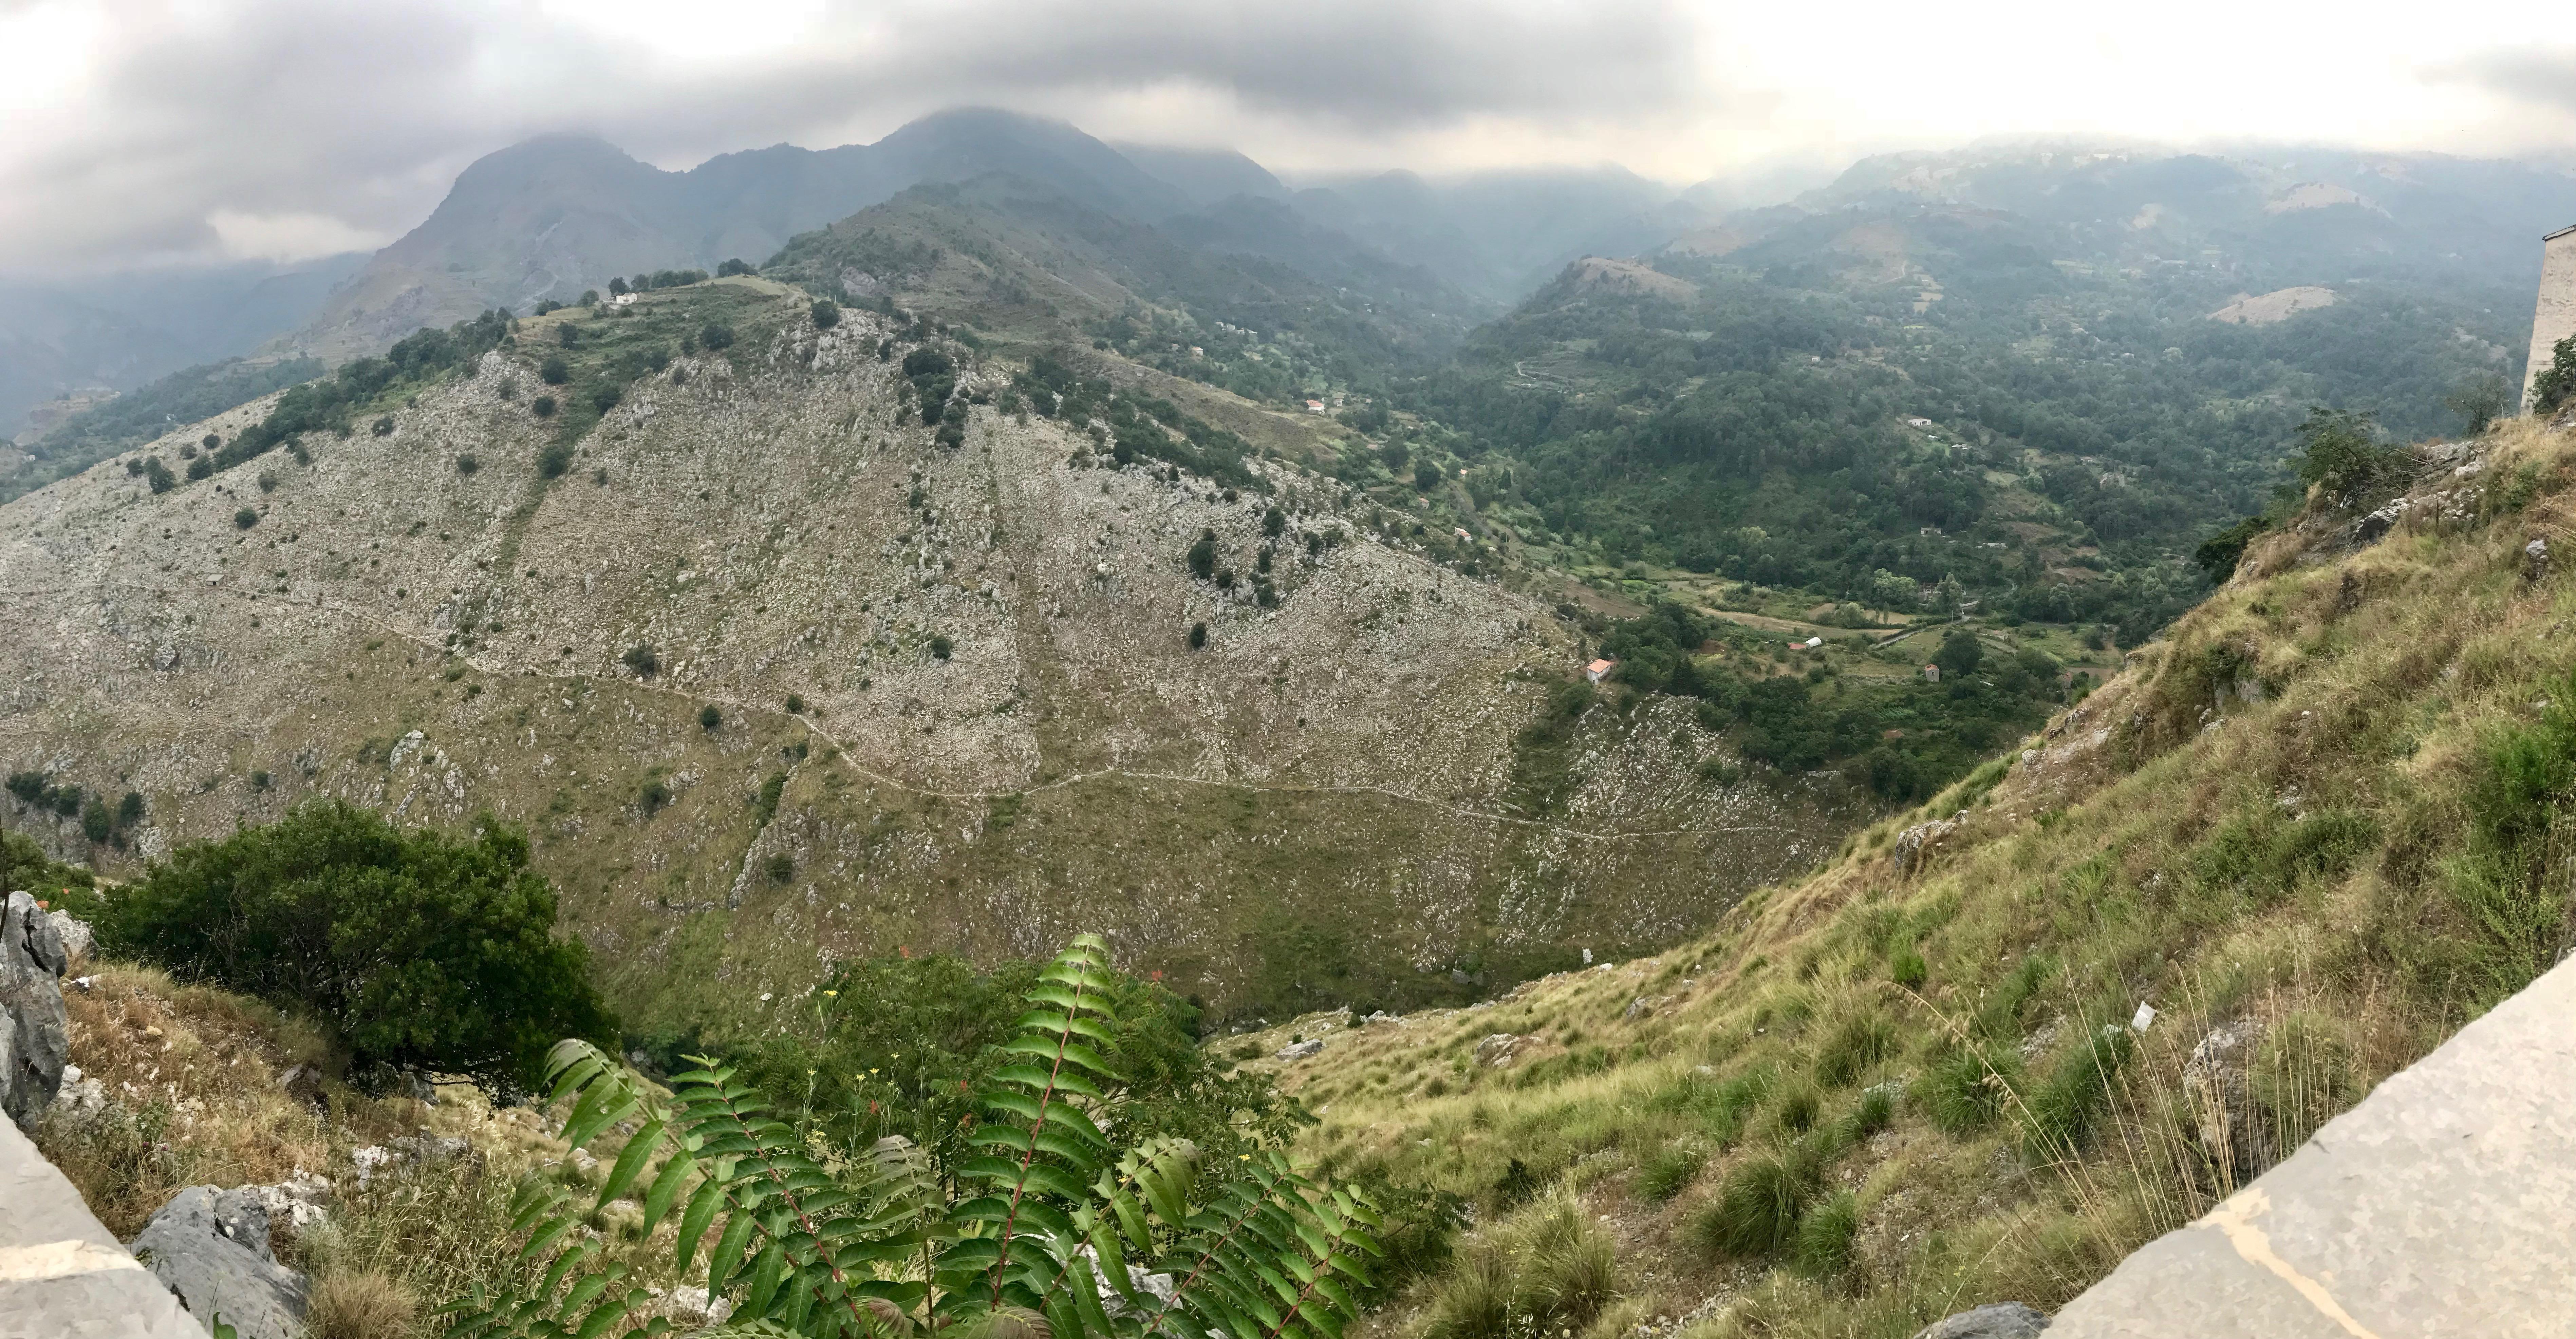 Aieta - Parco del Pollino